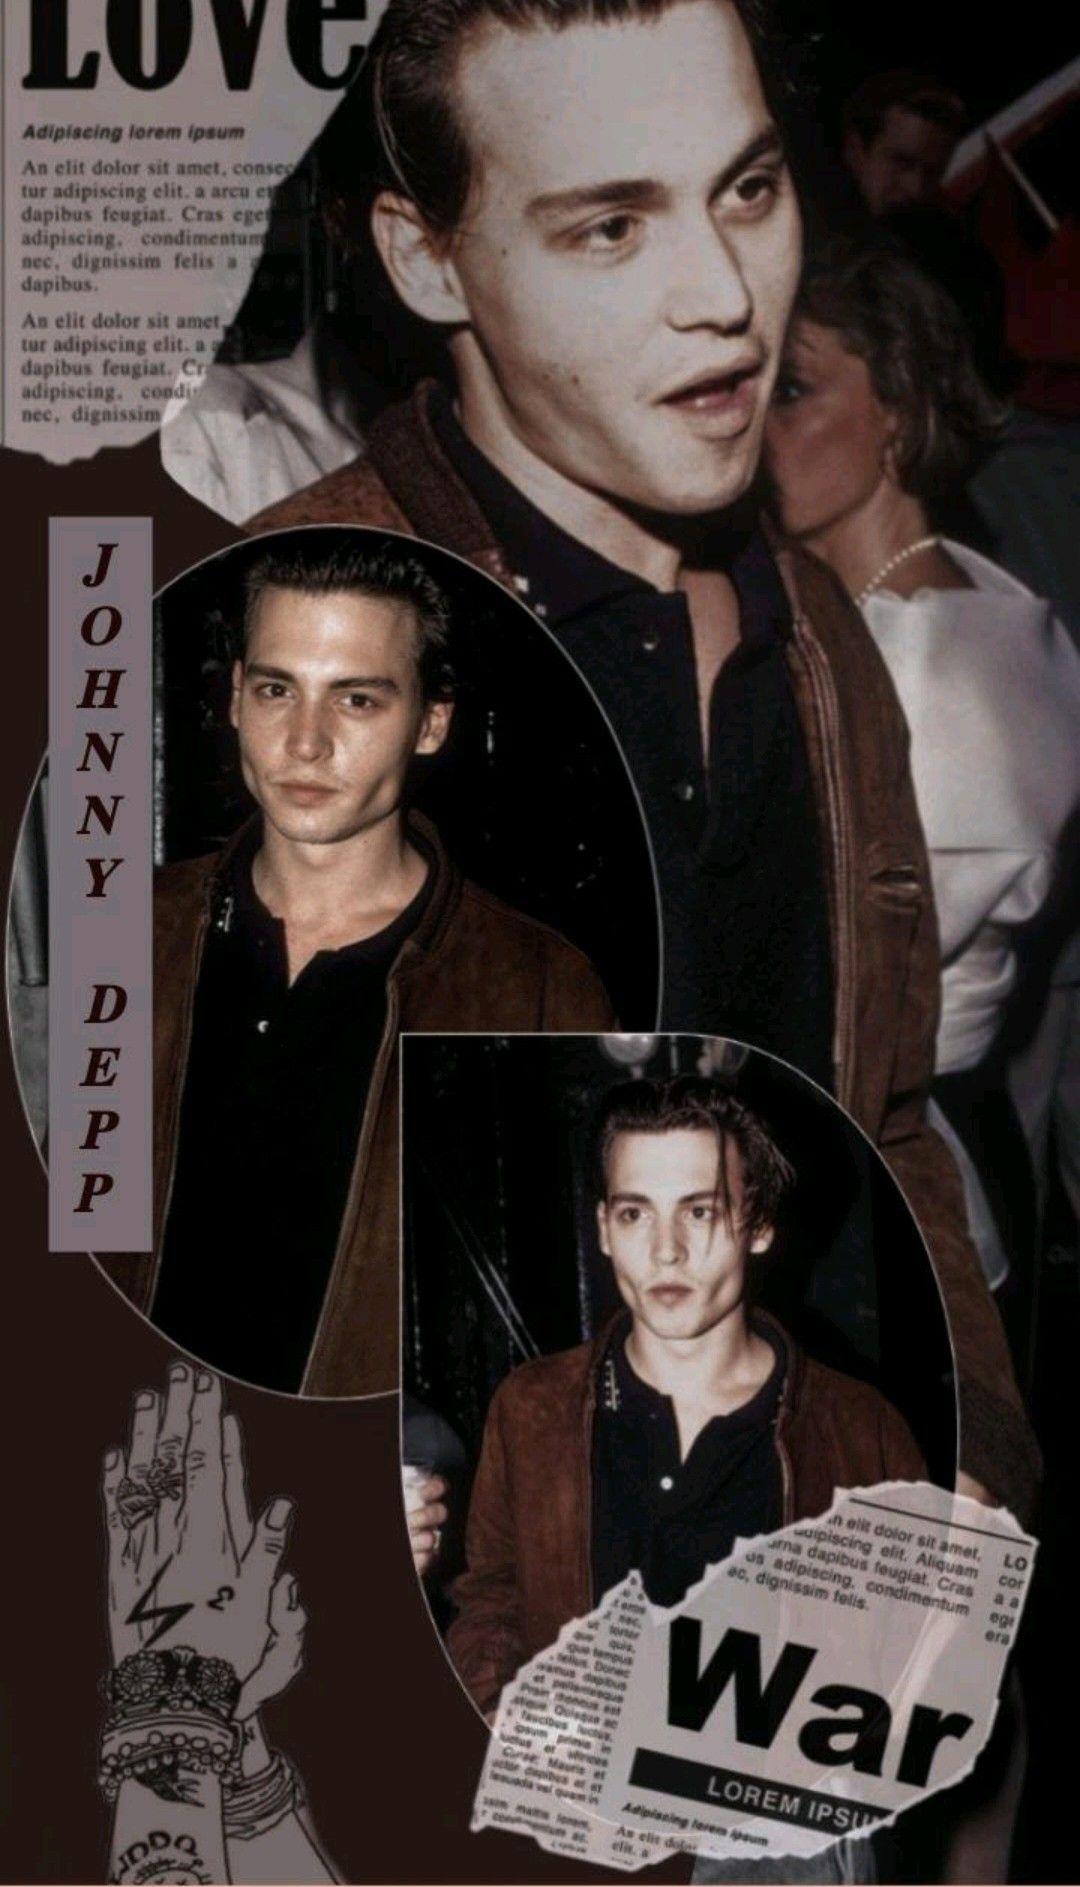 Johnny Depp Wallpaper Johnny Depp Wallpaper Johnny Depp Young Johnny Depp